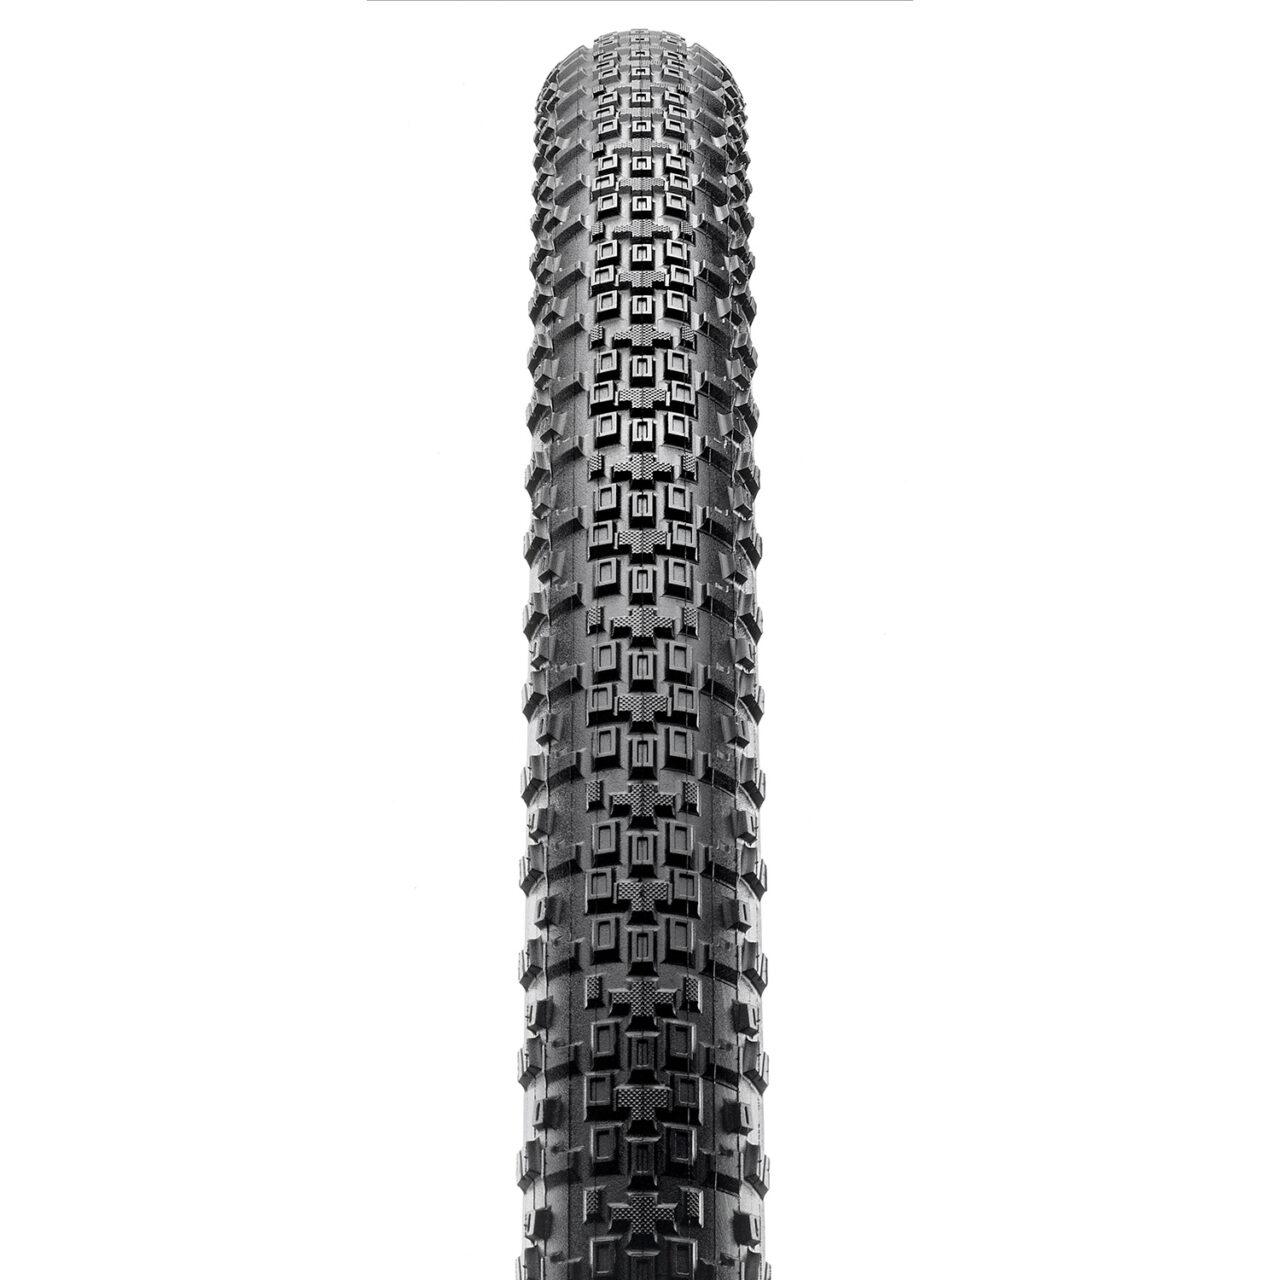 Maxxis Rambler bicycle tire tread